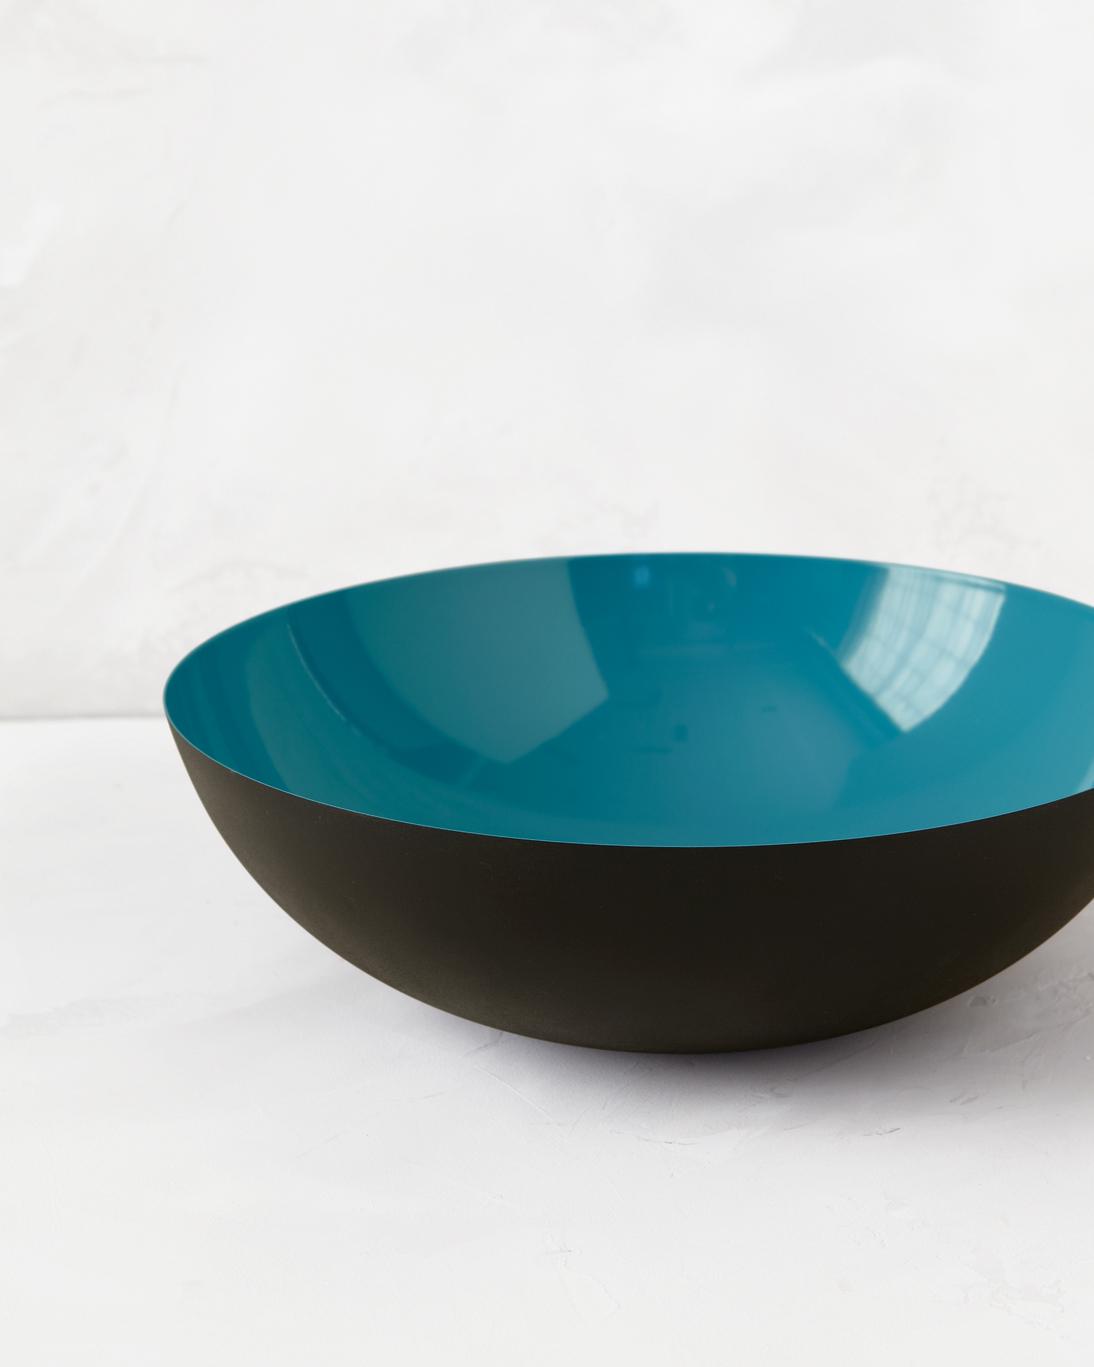 normann-copenhagen-bowl-mwd108187.jpg